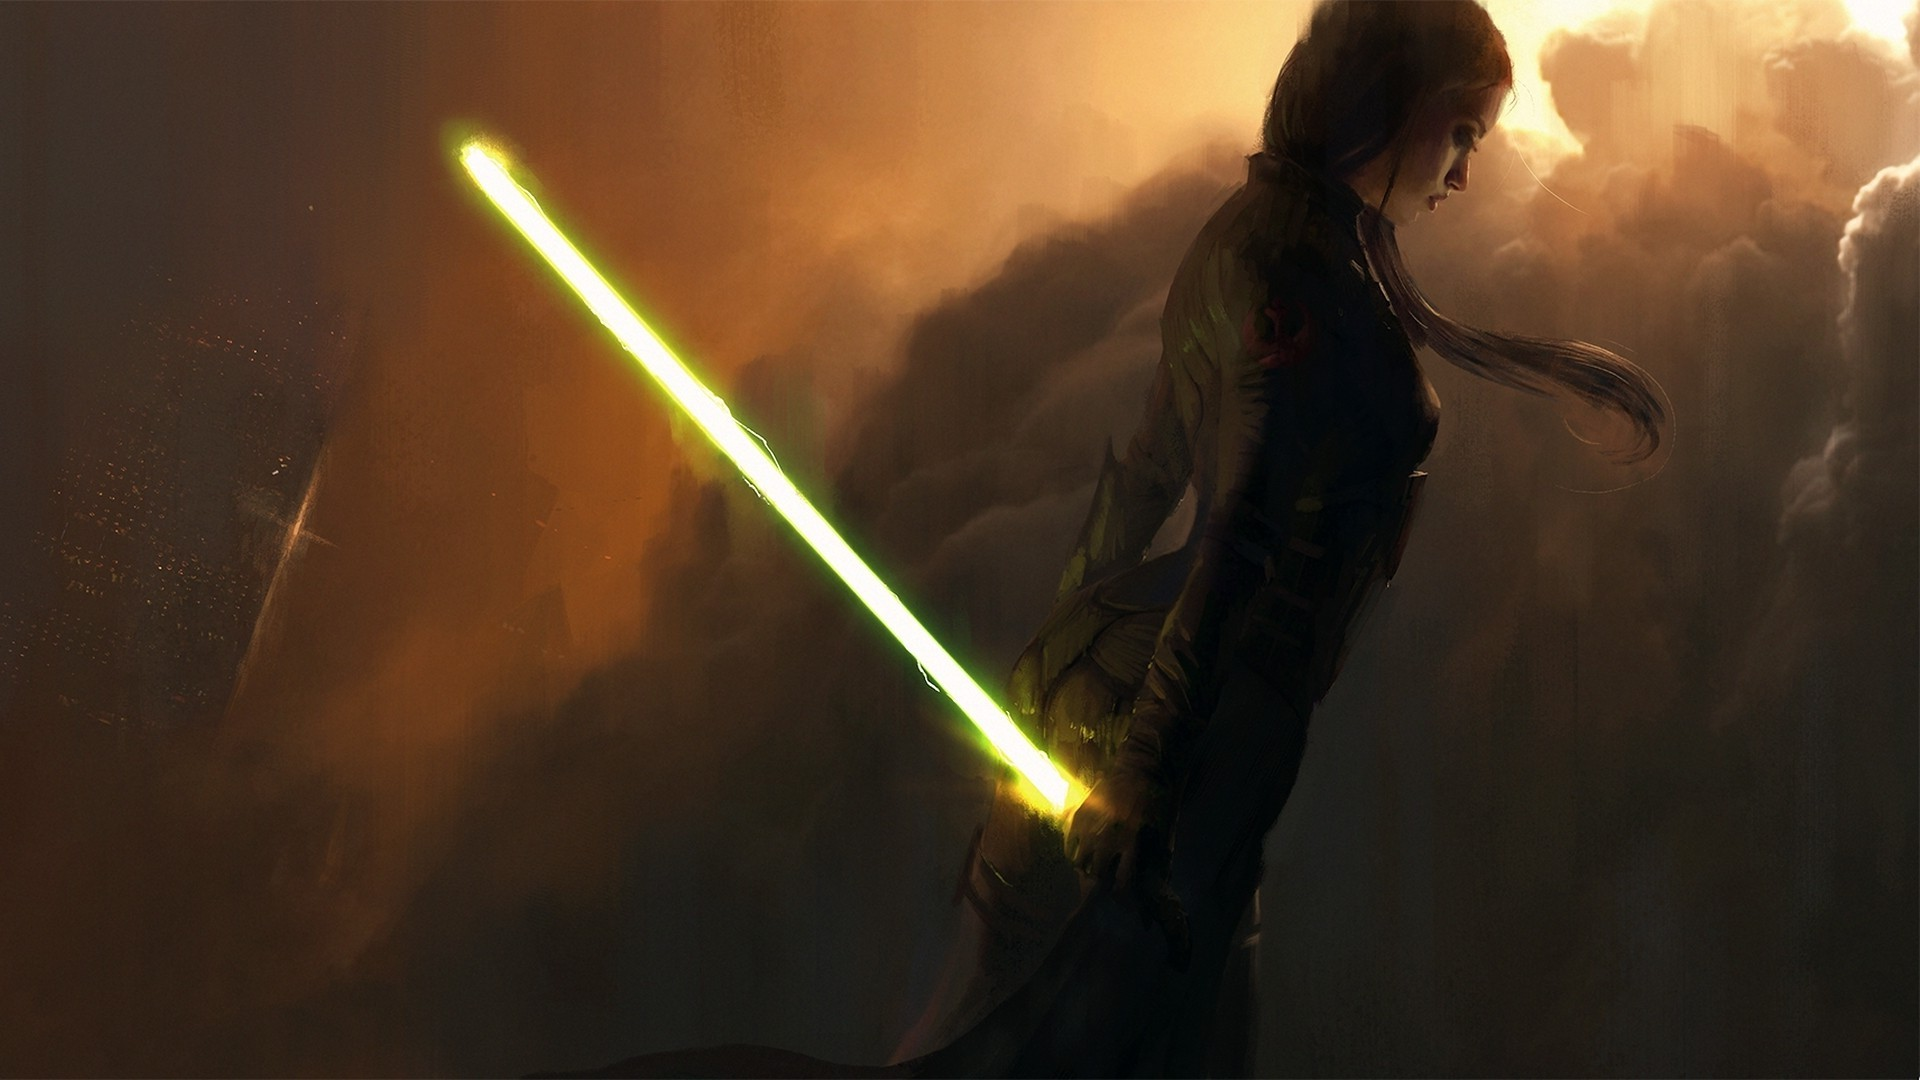 Jedi Star Wars Lightsaber Wallpapers HD Desktop and Mobile 1920x1080